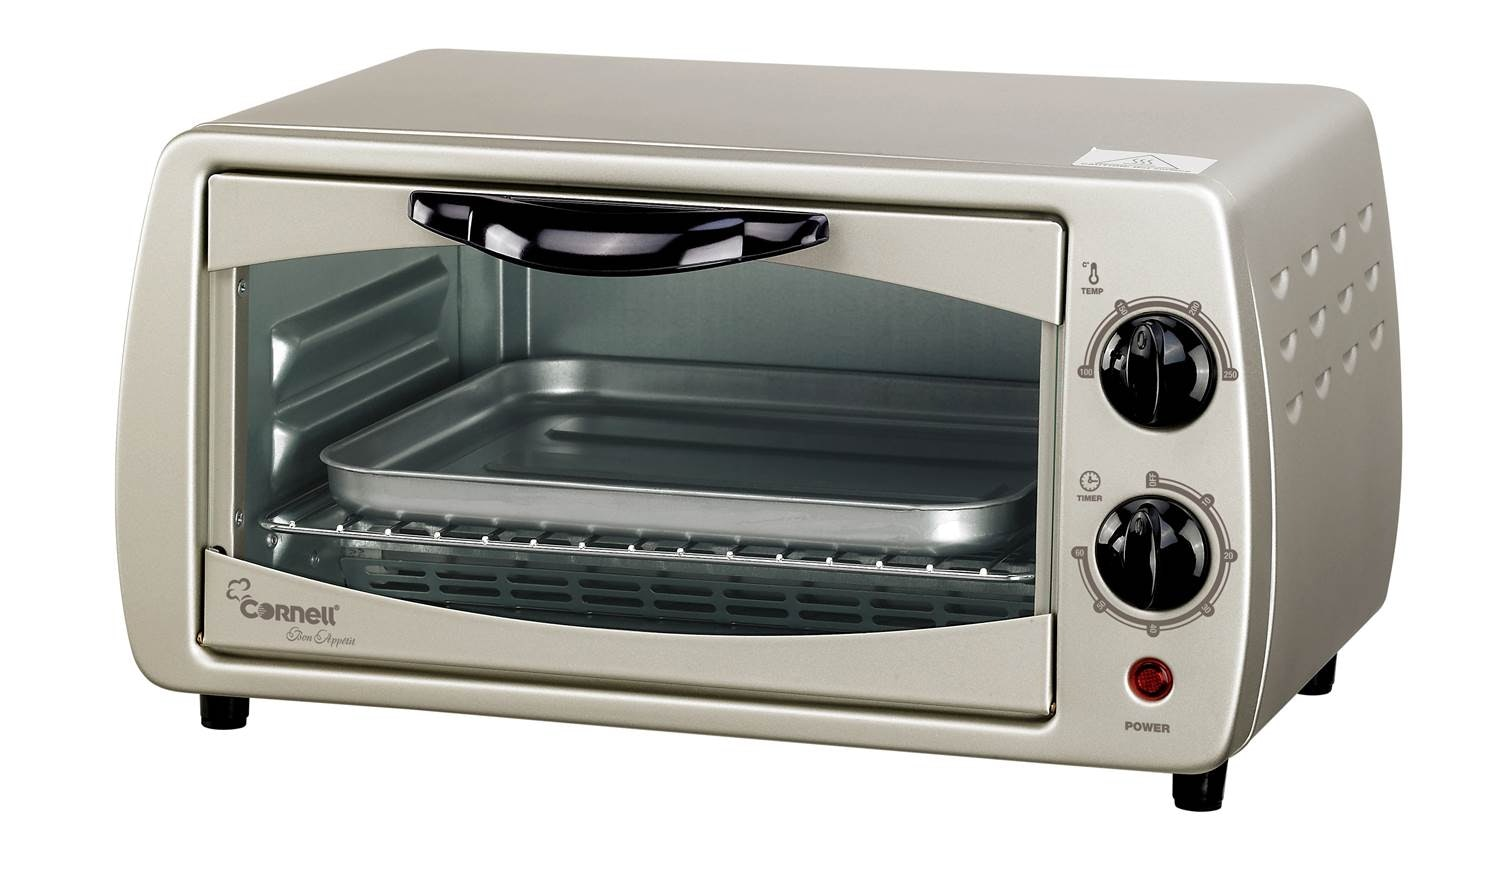 Cornell Cto 12hp Toaster Oven Harvey Norman Singapore